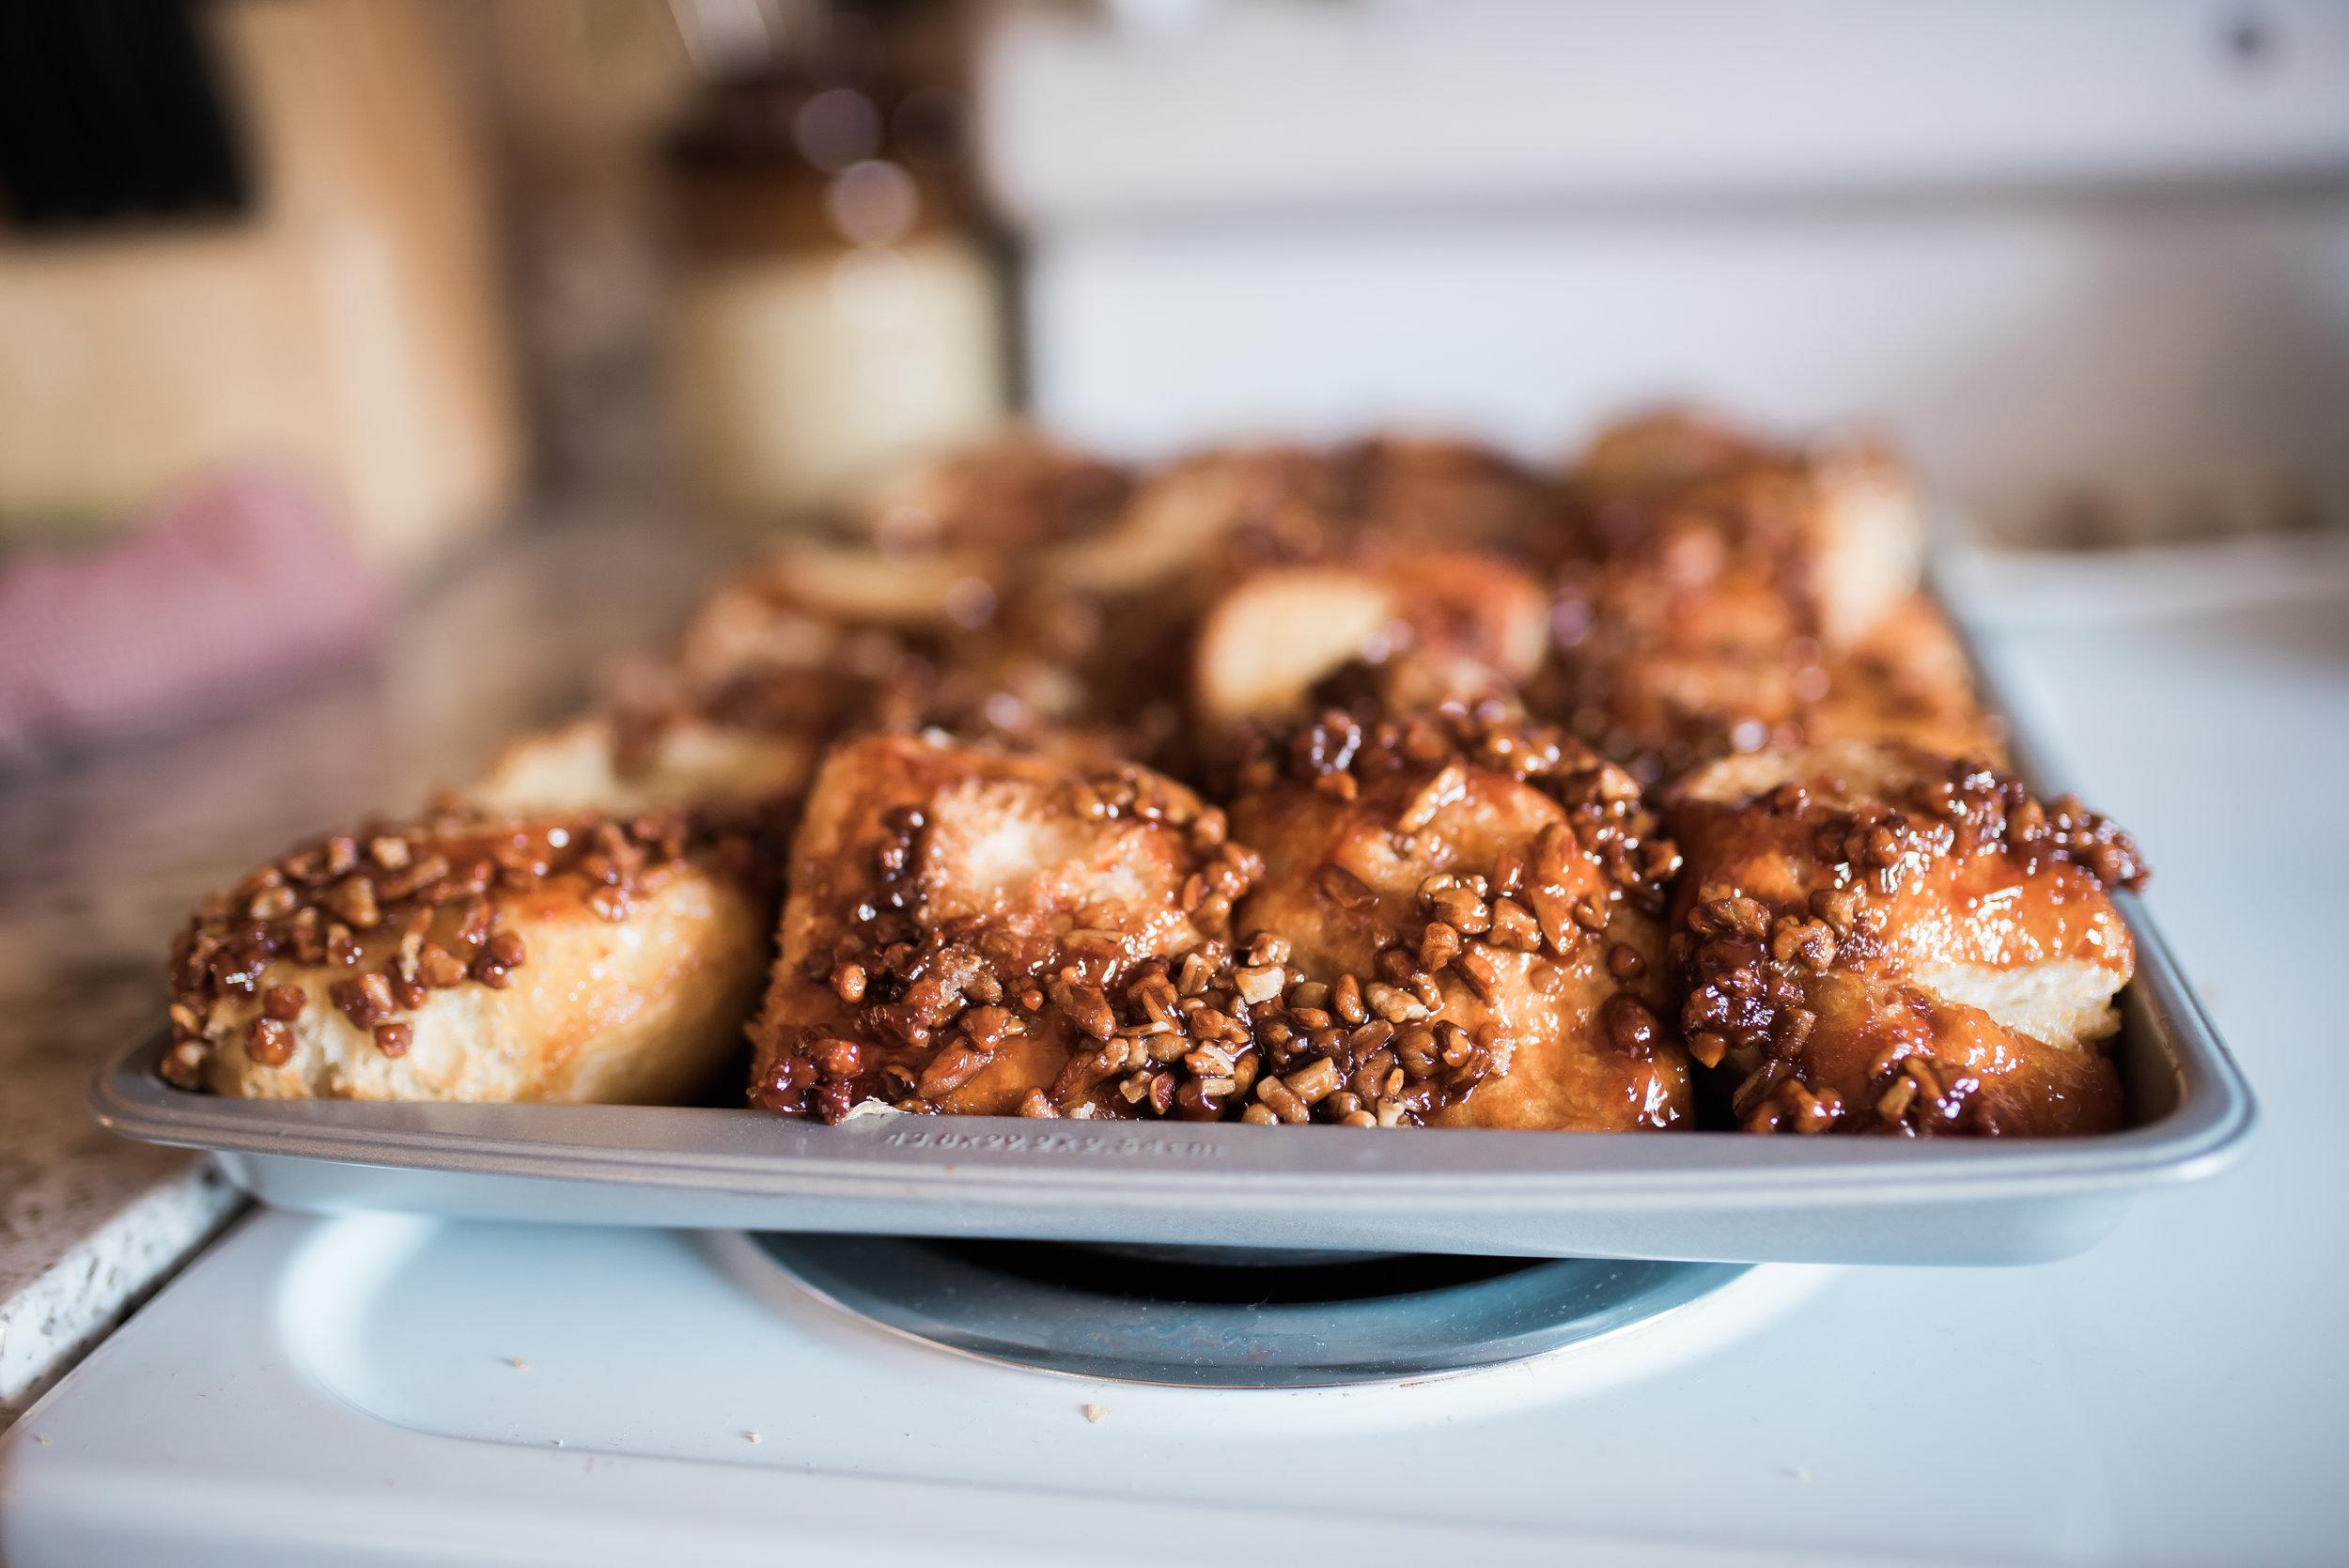 Jeanne made sticky carmel rolls to bring - YUM!